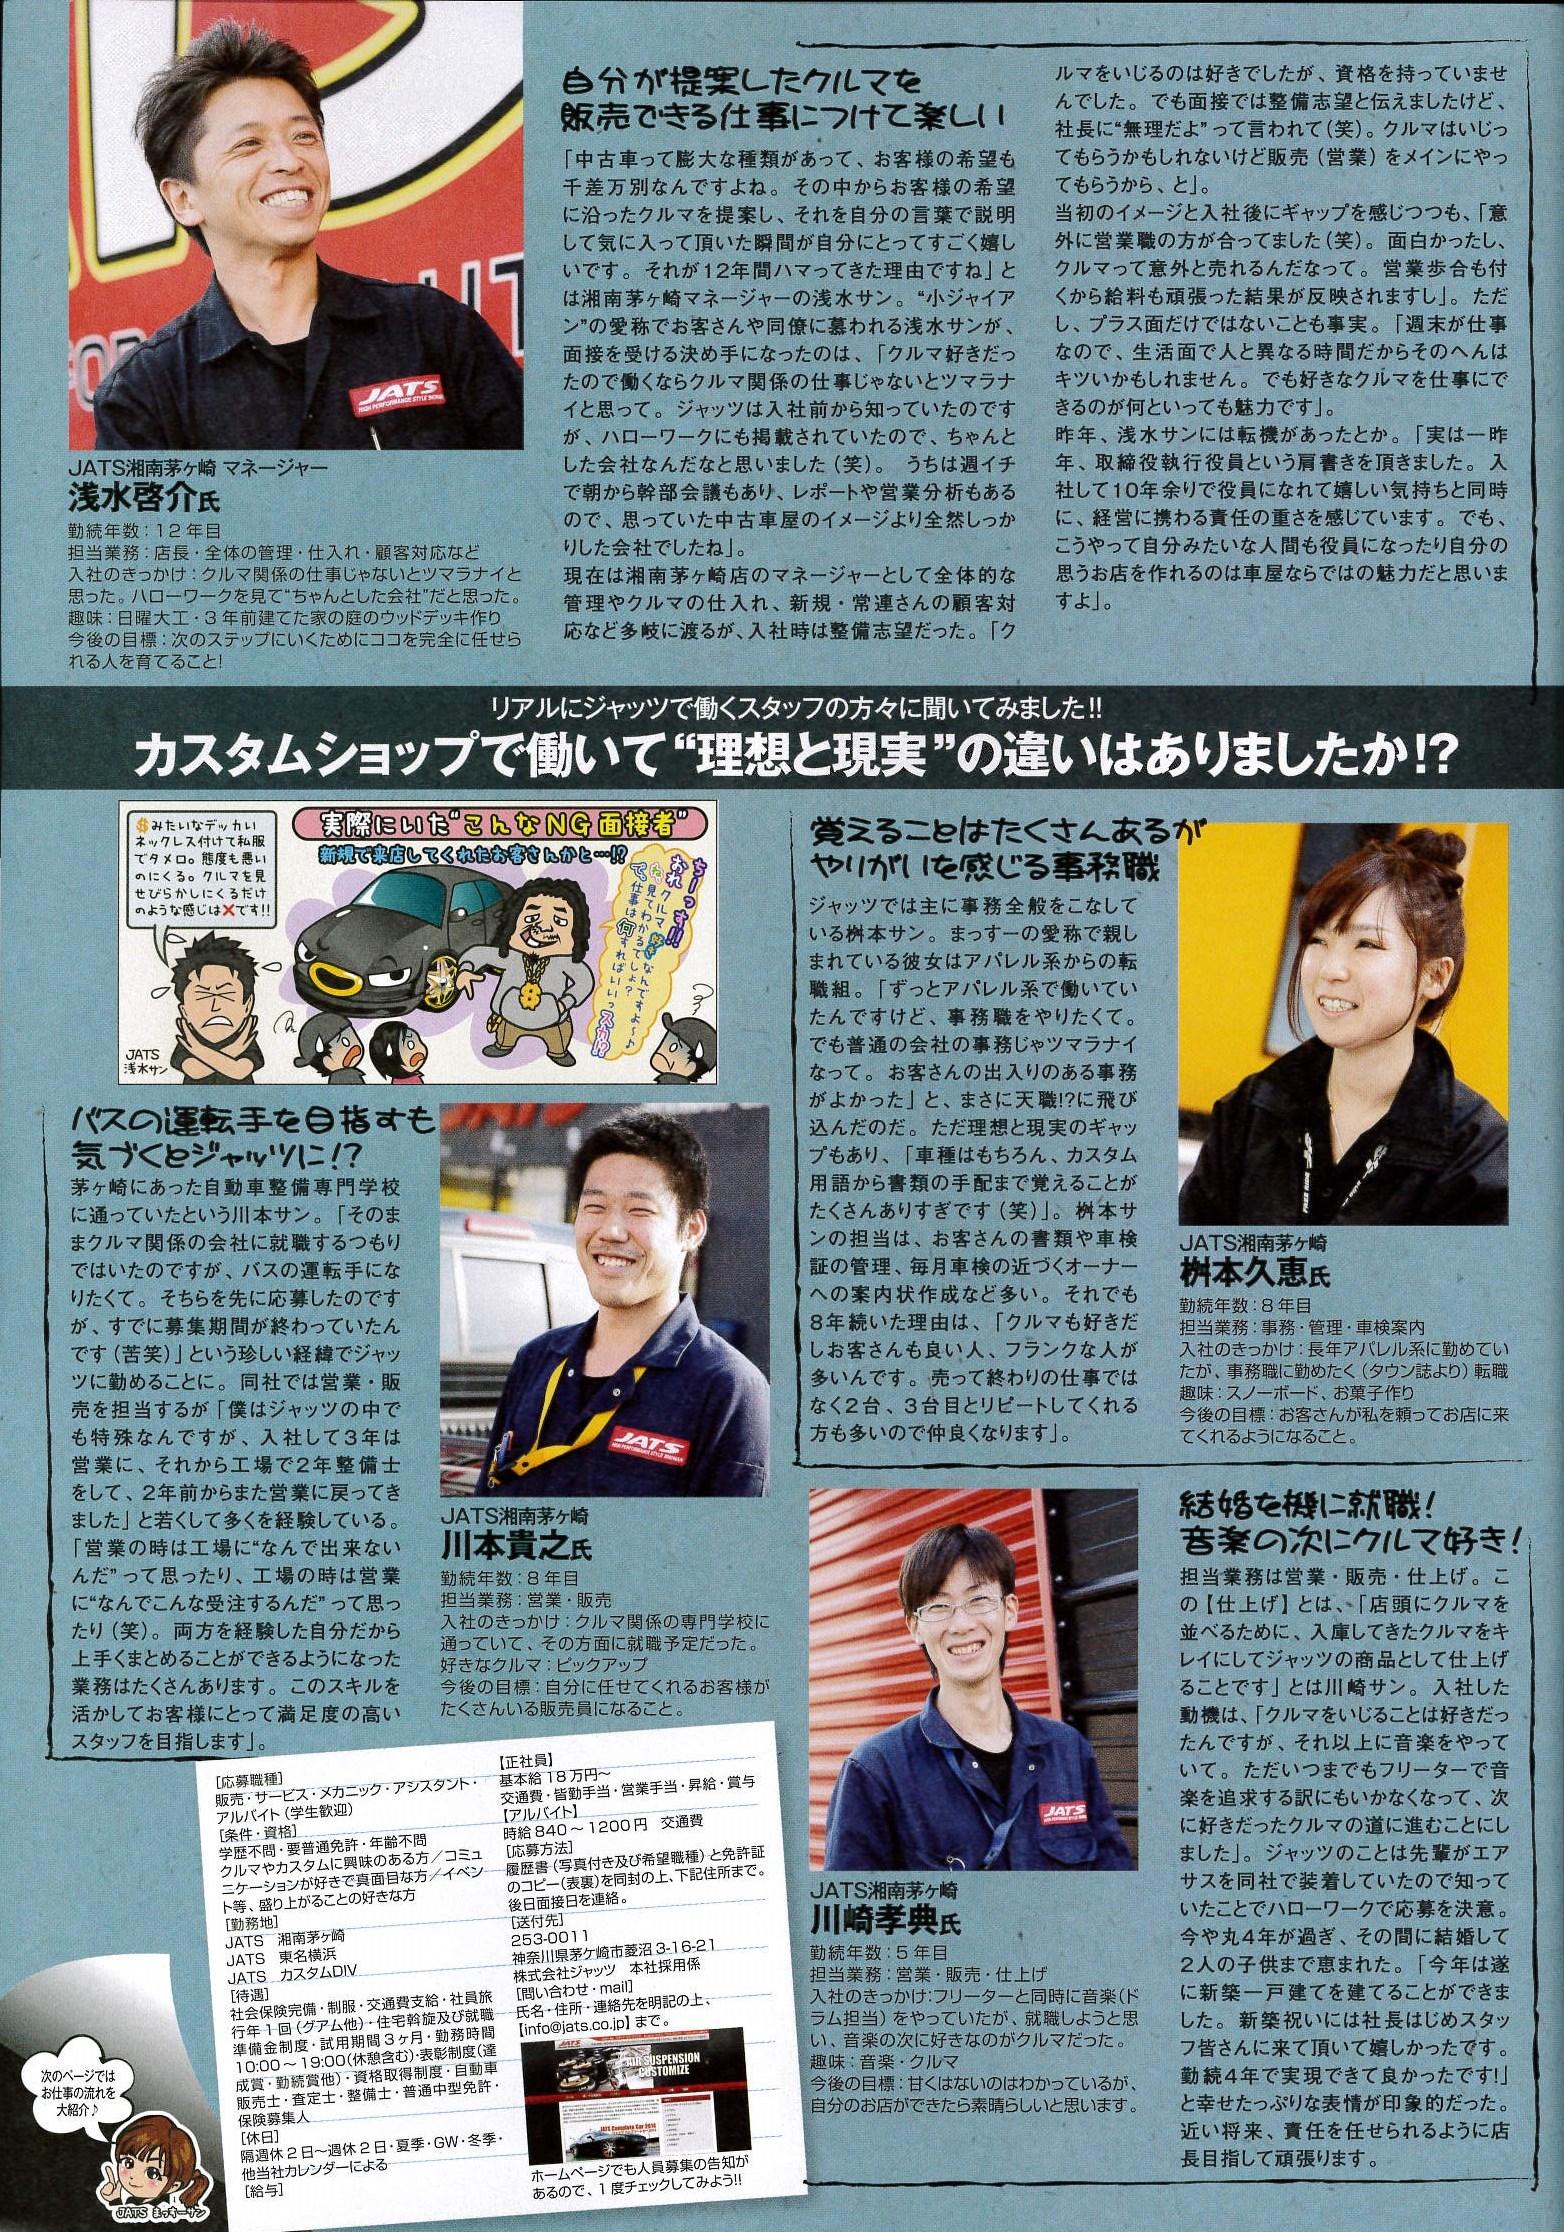 honsya@/jats.co.jp_20140425_161312_001